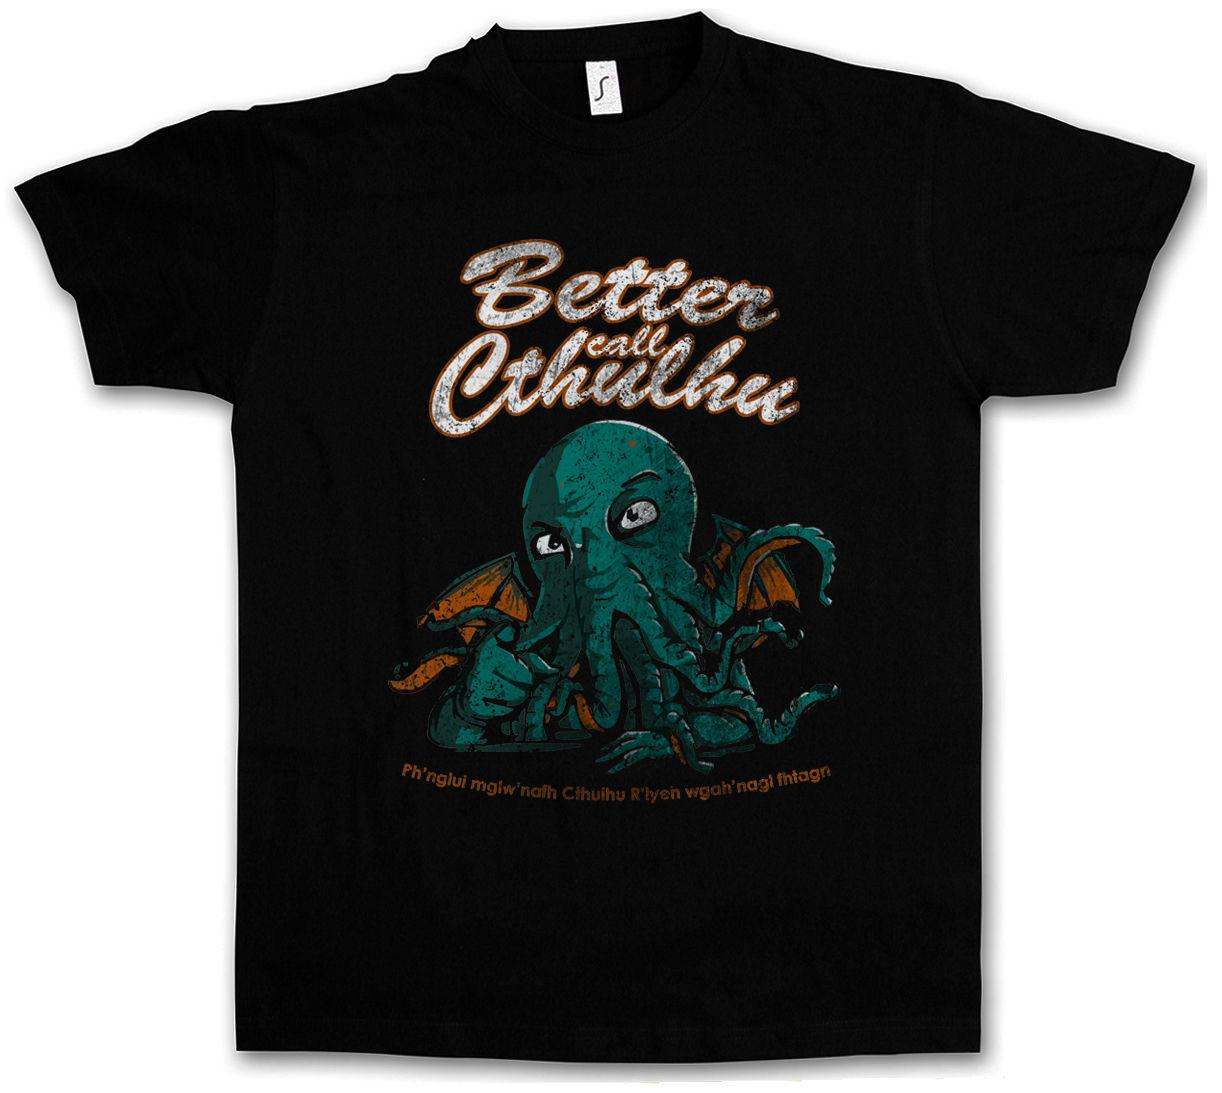 Compre HP Llamada Arkham Cthulhu Wars Camiseta Horror Mejor nv8NwOy0m